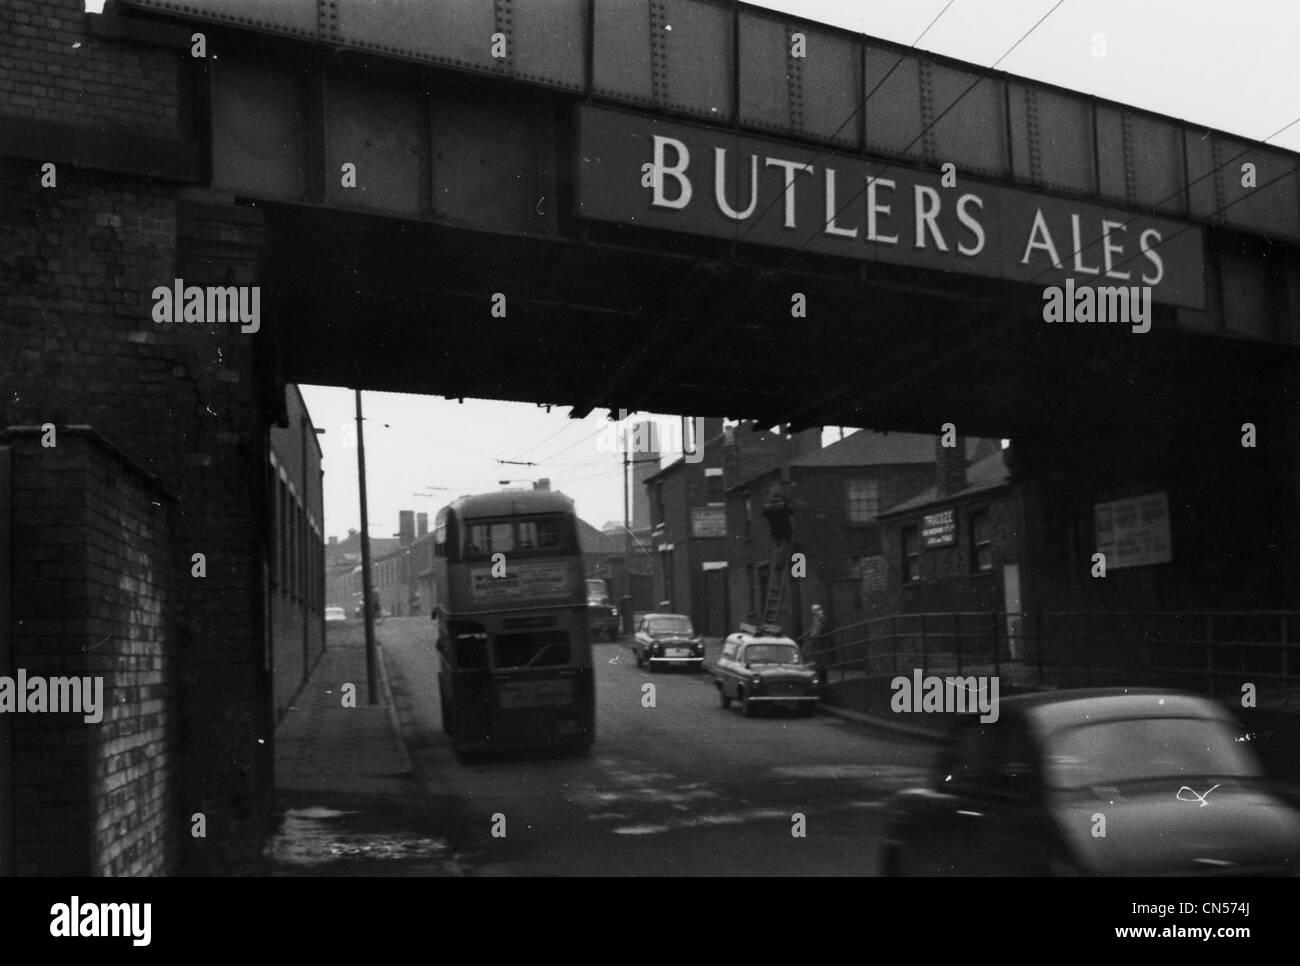 Railway Bridge, Horseley Fields, Wolverhampton, mid 20th century. - Stock Image